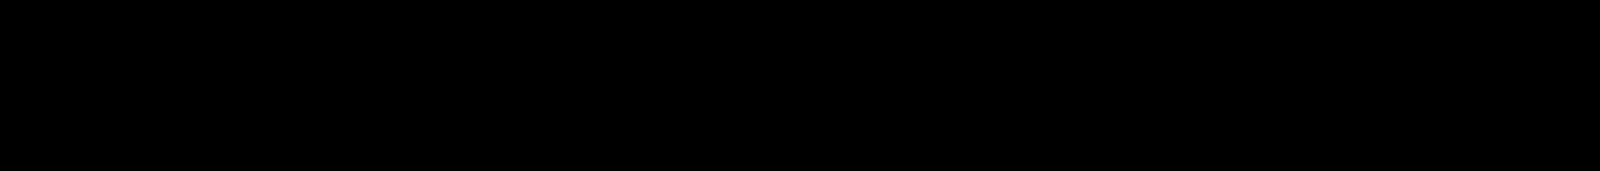 Romanian Fonts Fontspace